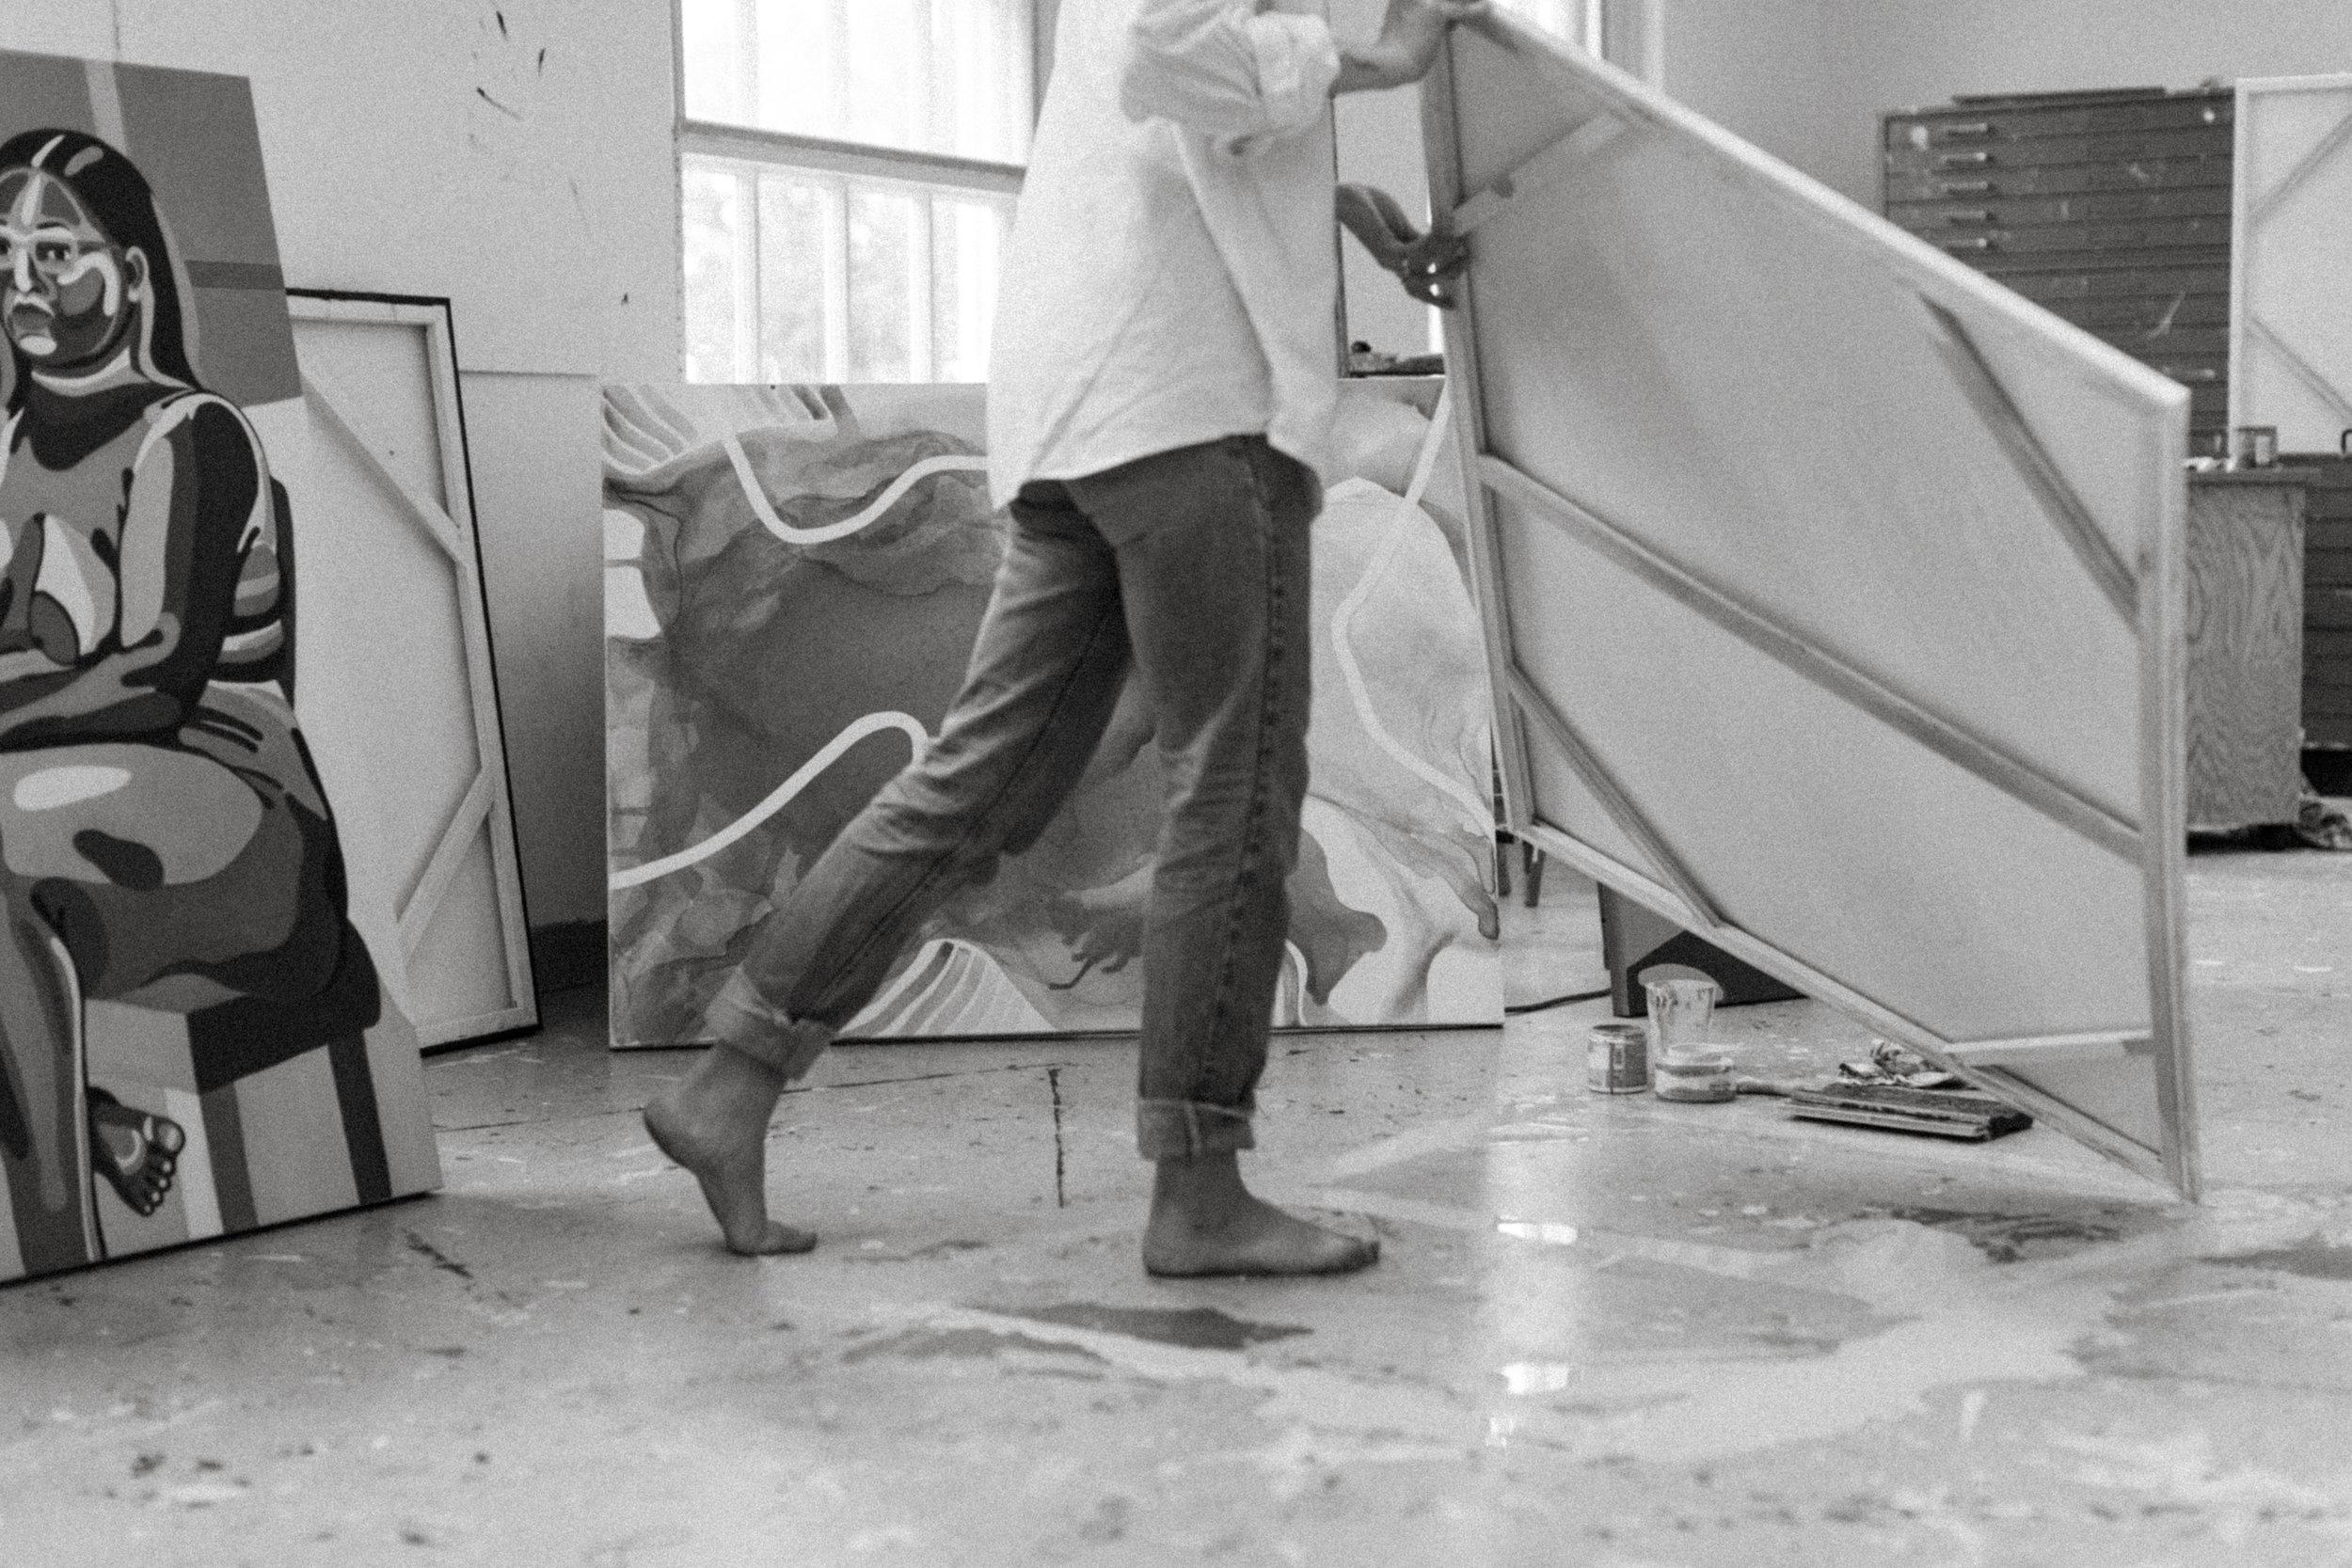 emily-pawlica-art-process-2019-peytoncurry-0515-2.jpg